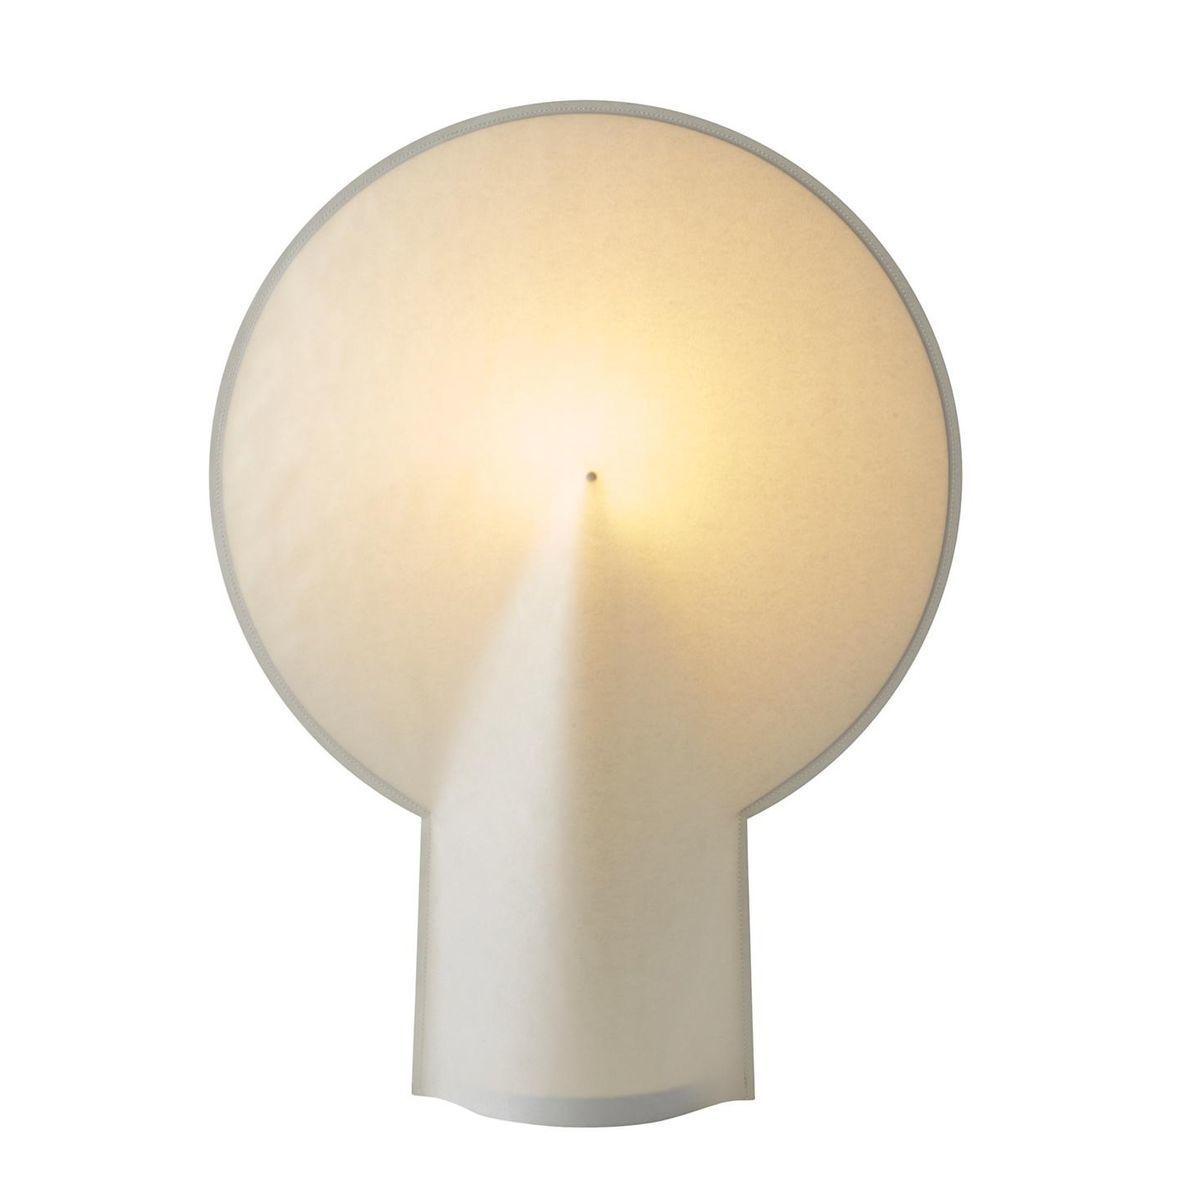 pion led table lamp hay. Black Bedroom Furniture Sets. Home Design Ideas